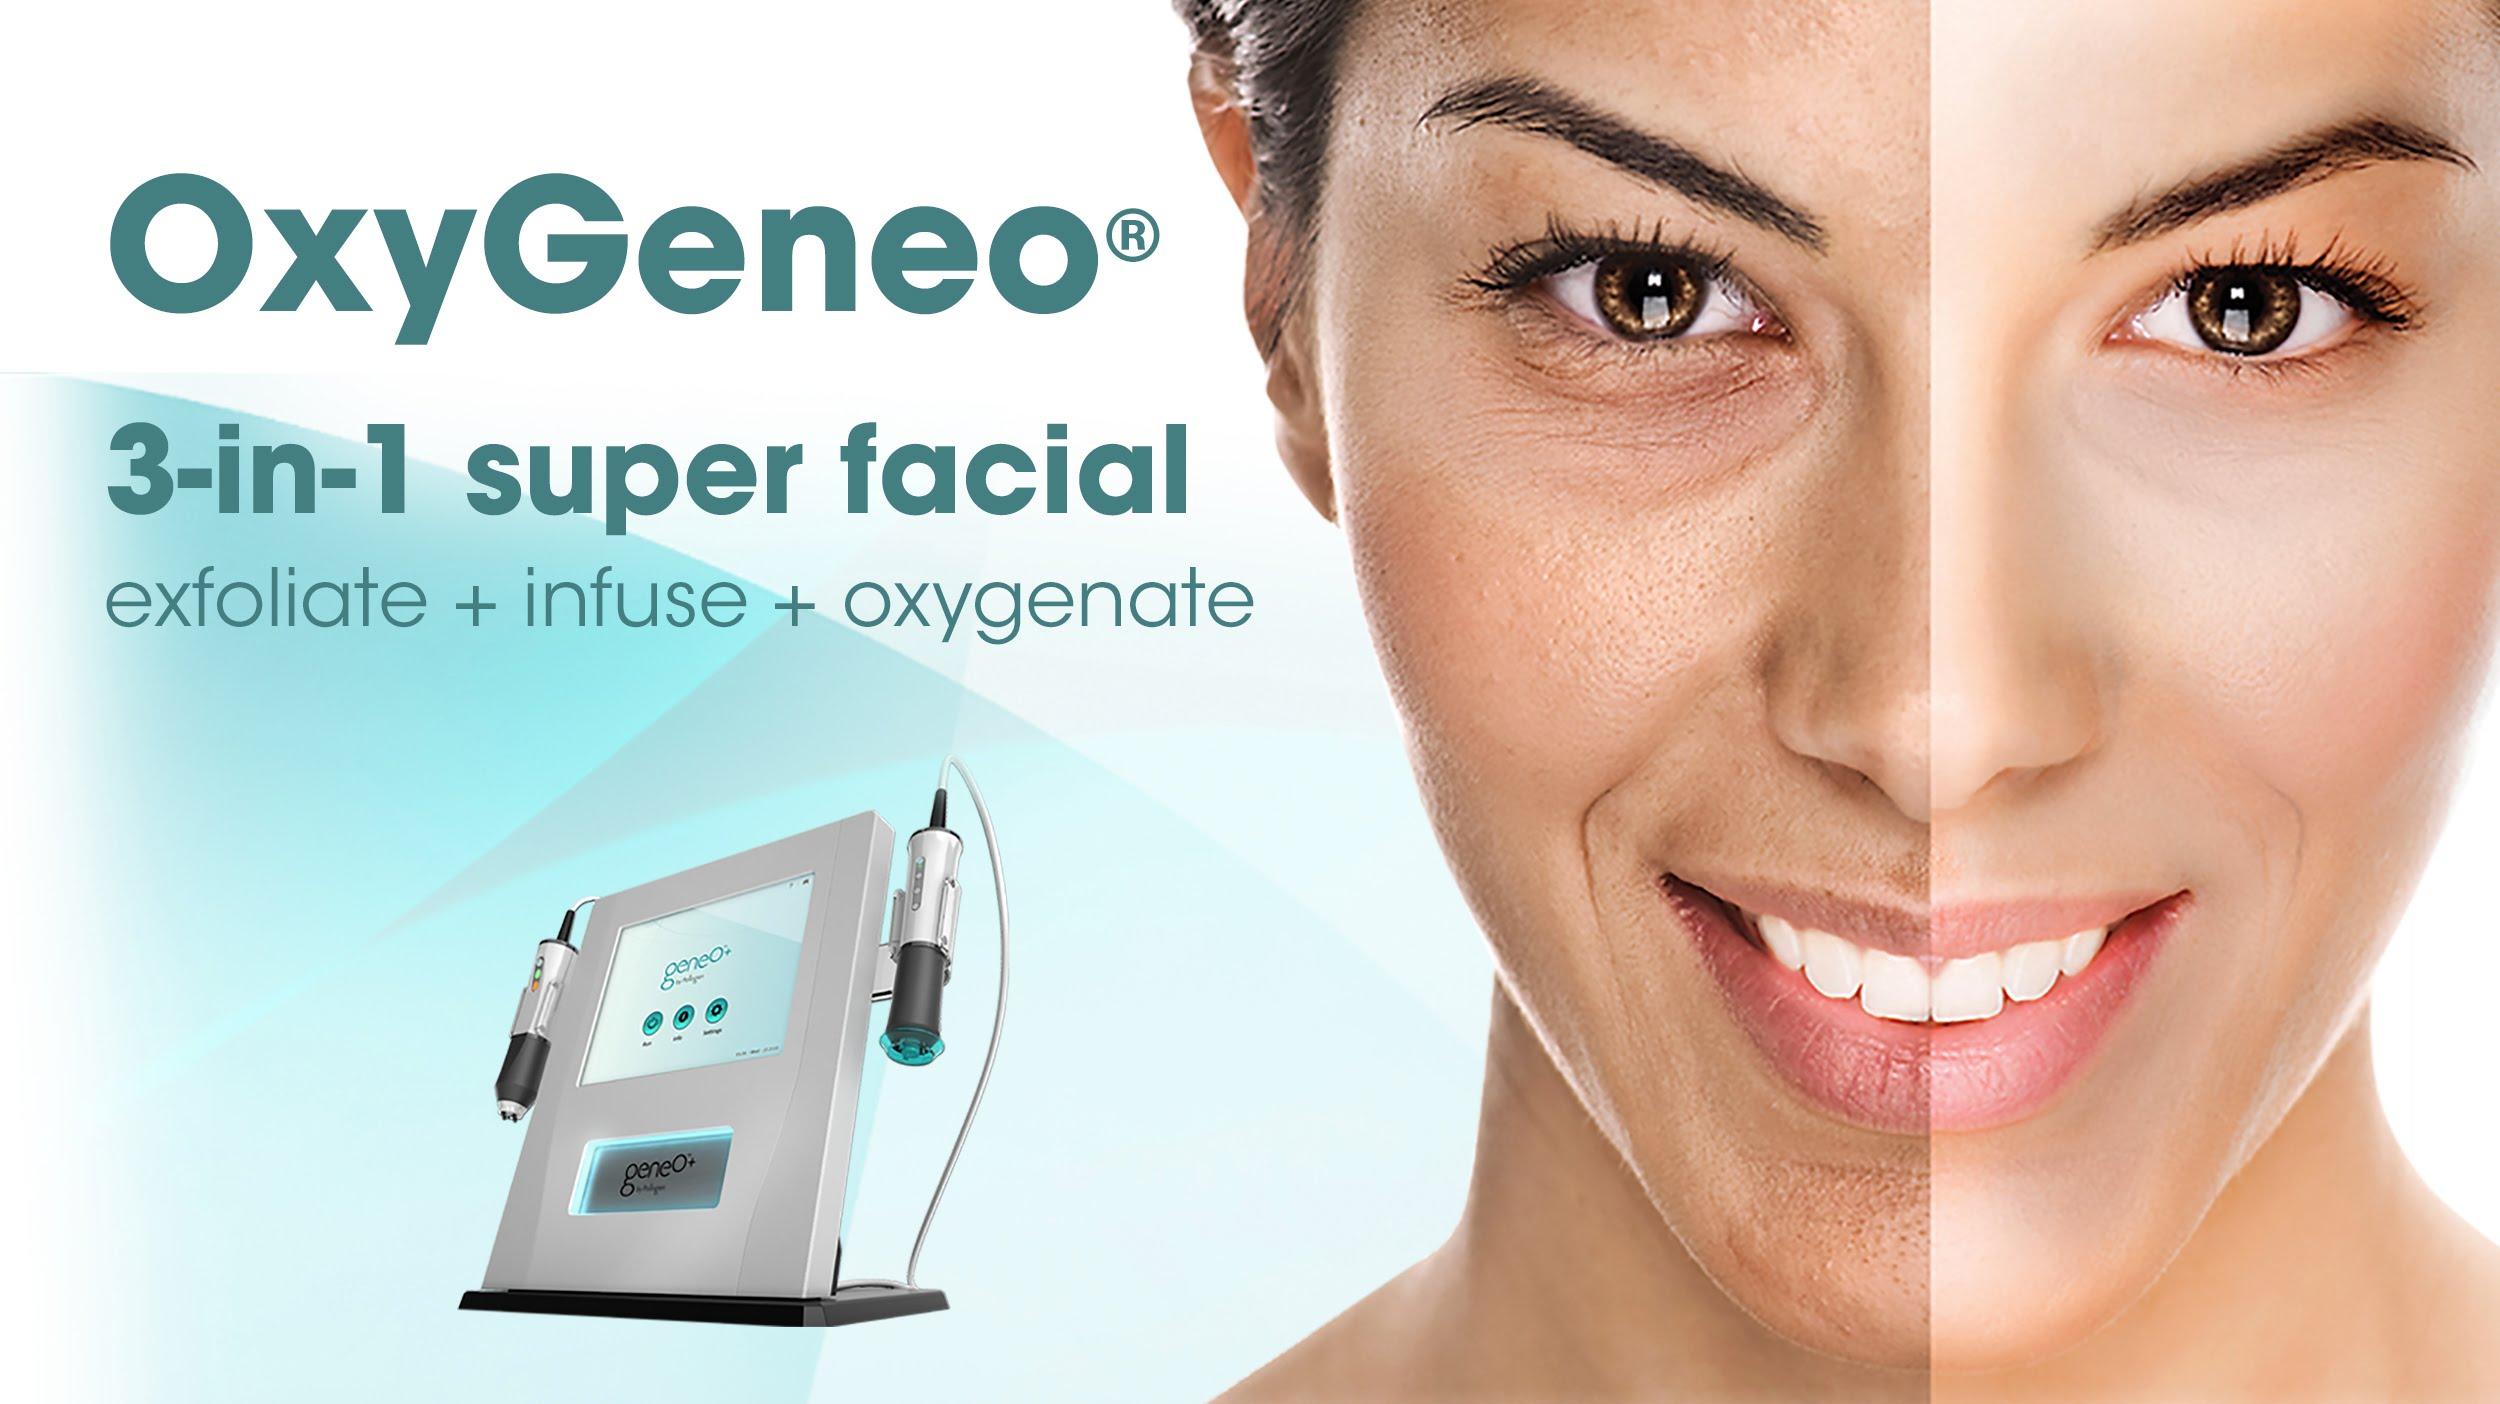 OxyGeneo Anti-Aging Facial in Springfield MO